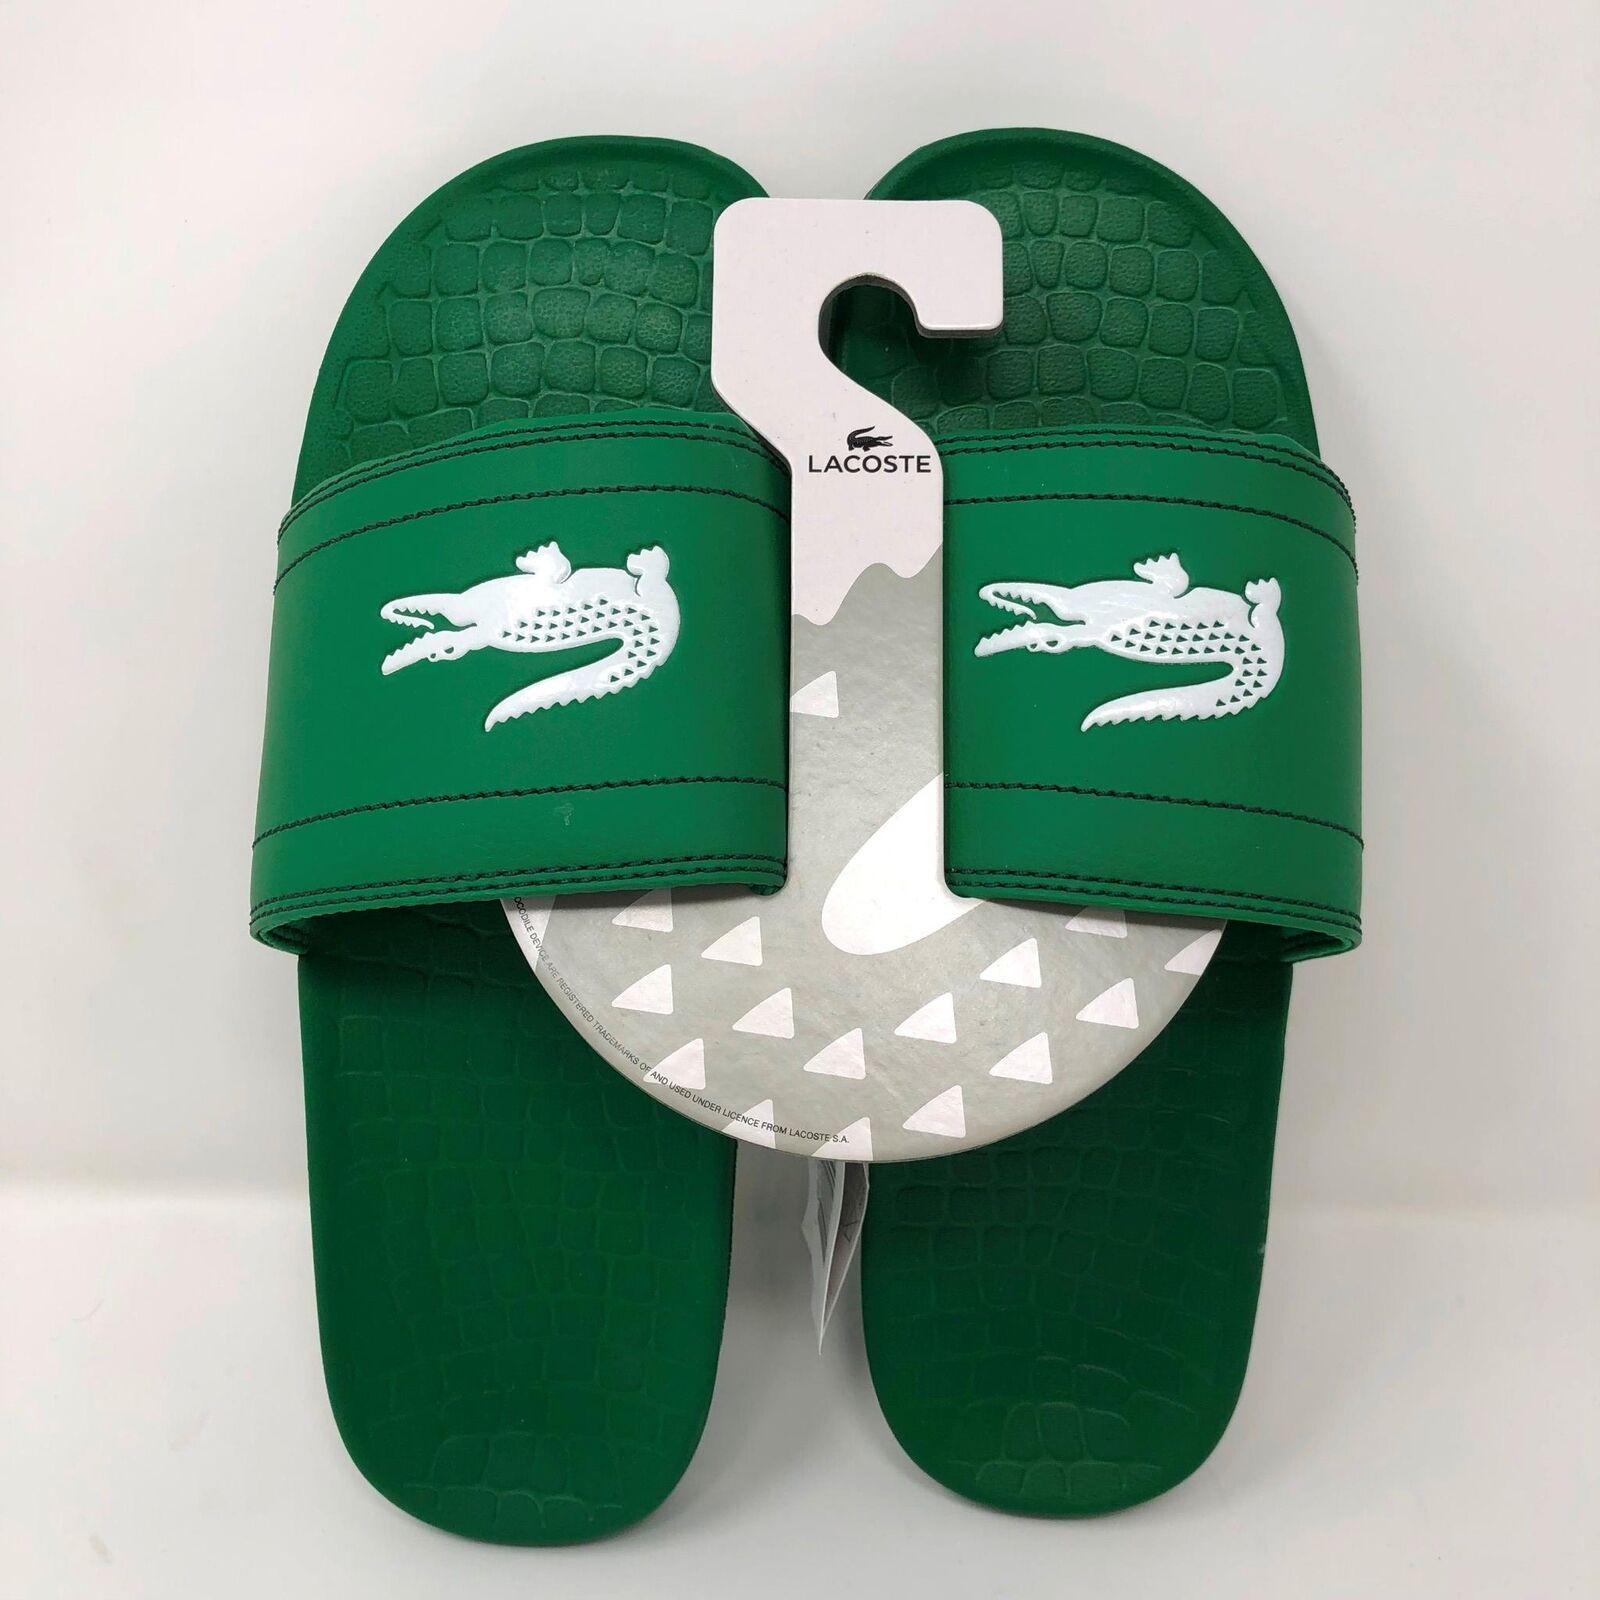 NWT Lacoste Mens Fraisier Slides Flip Flops Sandals Green Crocodile Logo Size 10